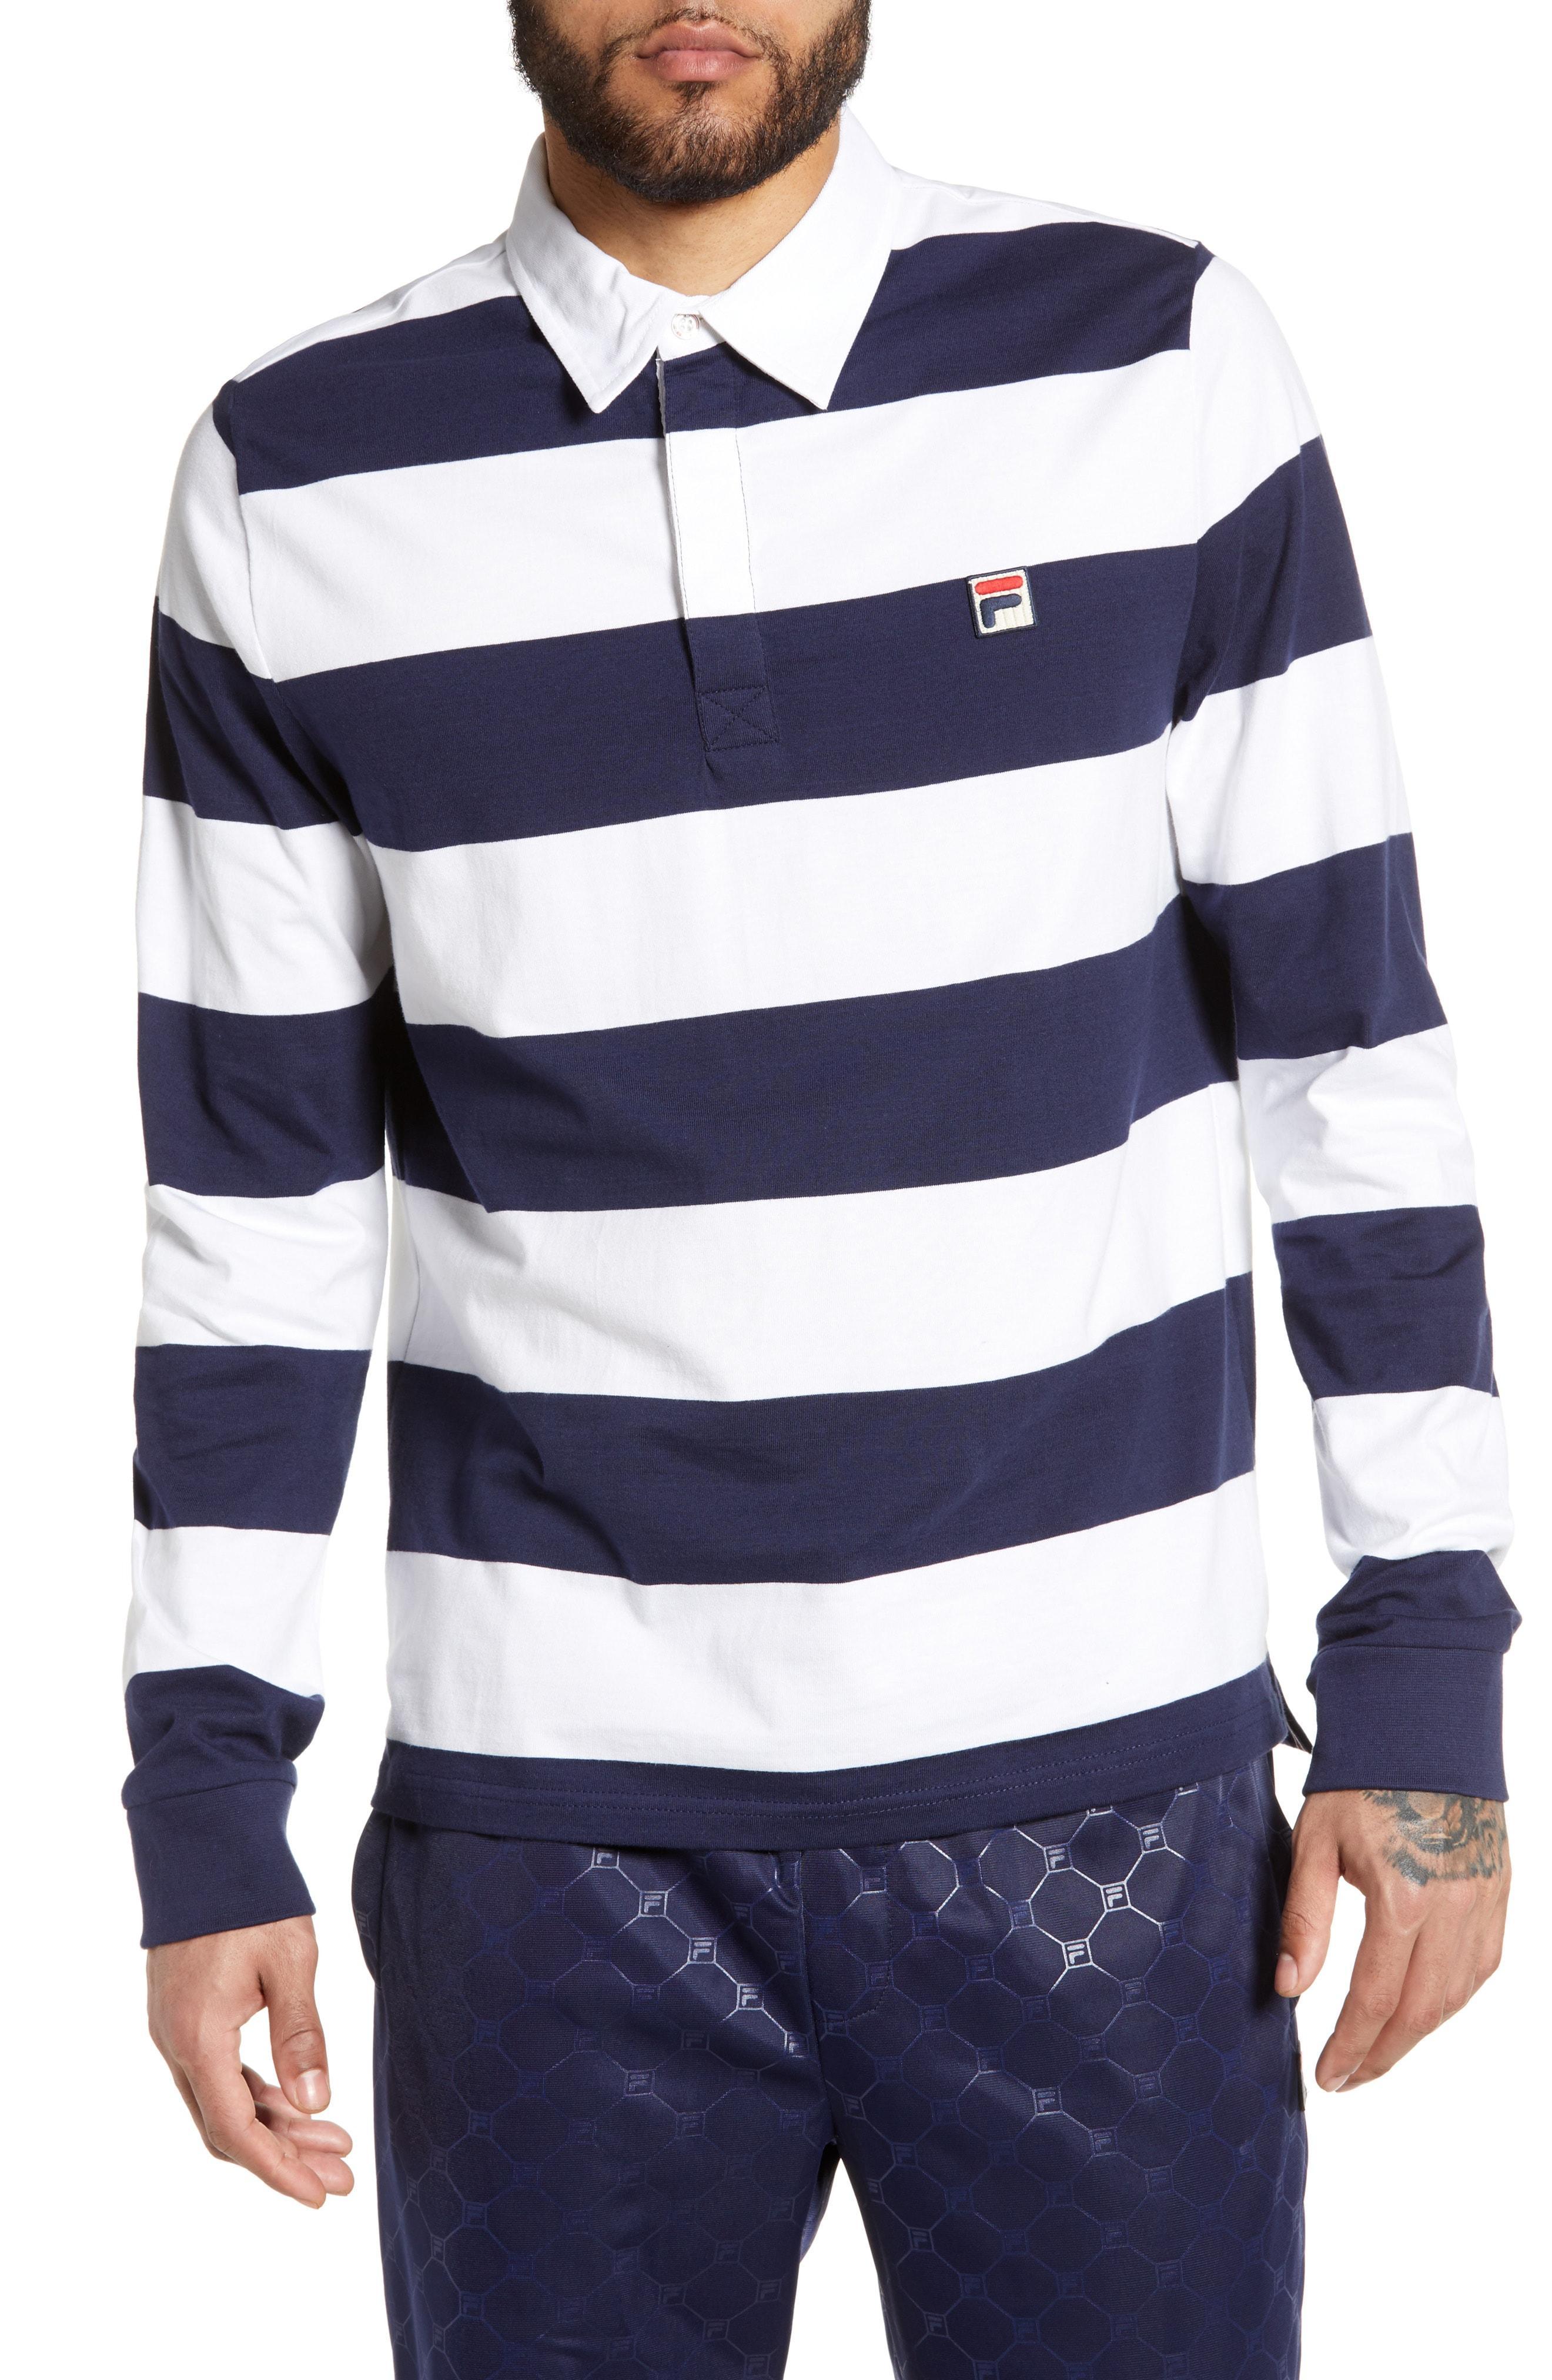 aac653d9 Lyst - Fila Oscar Rugby Shirt in Blue for Men